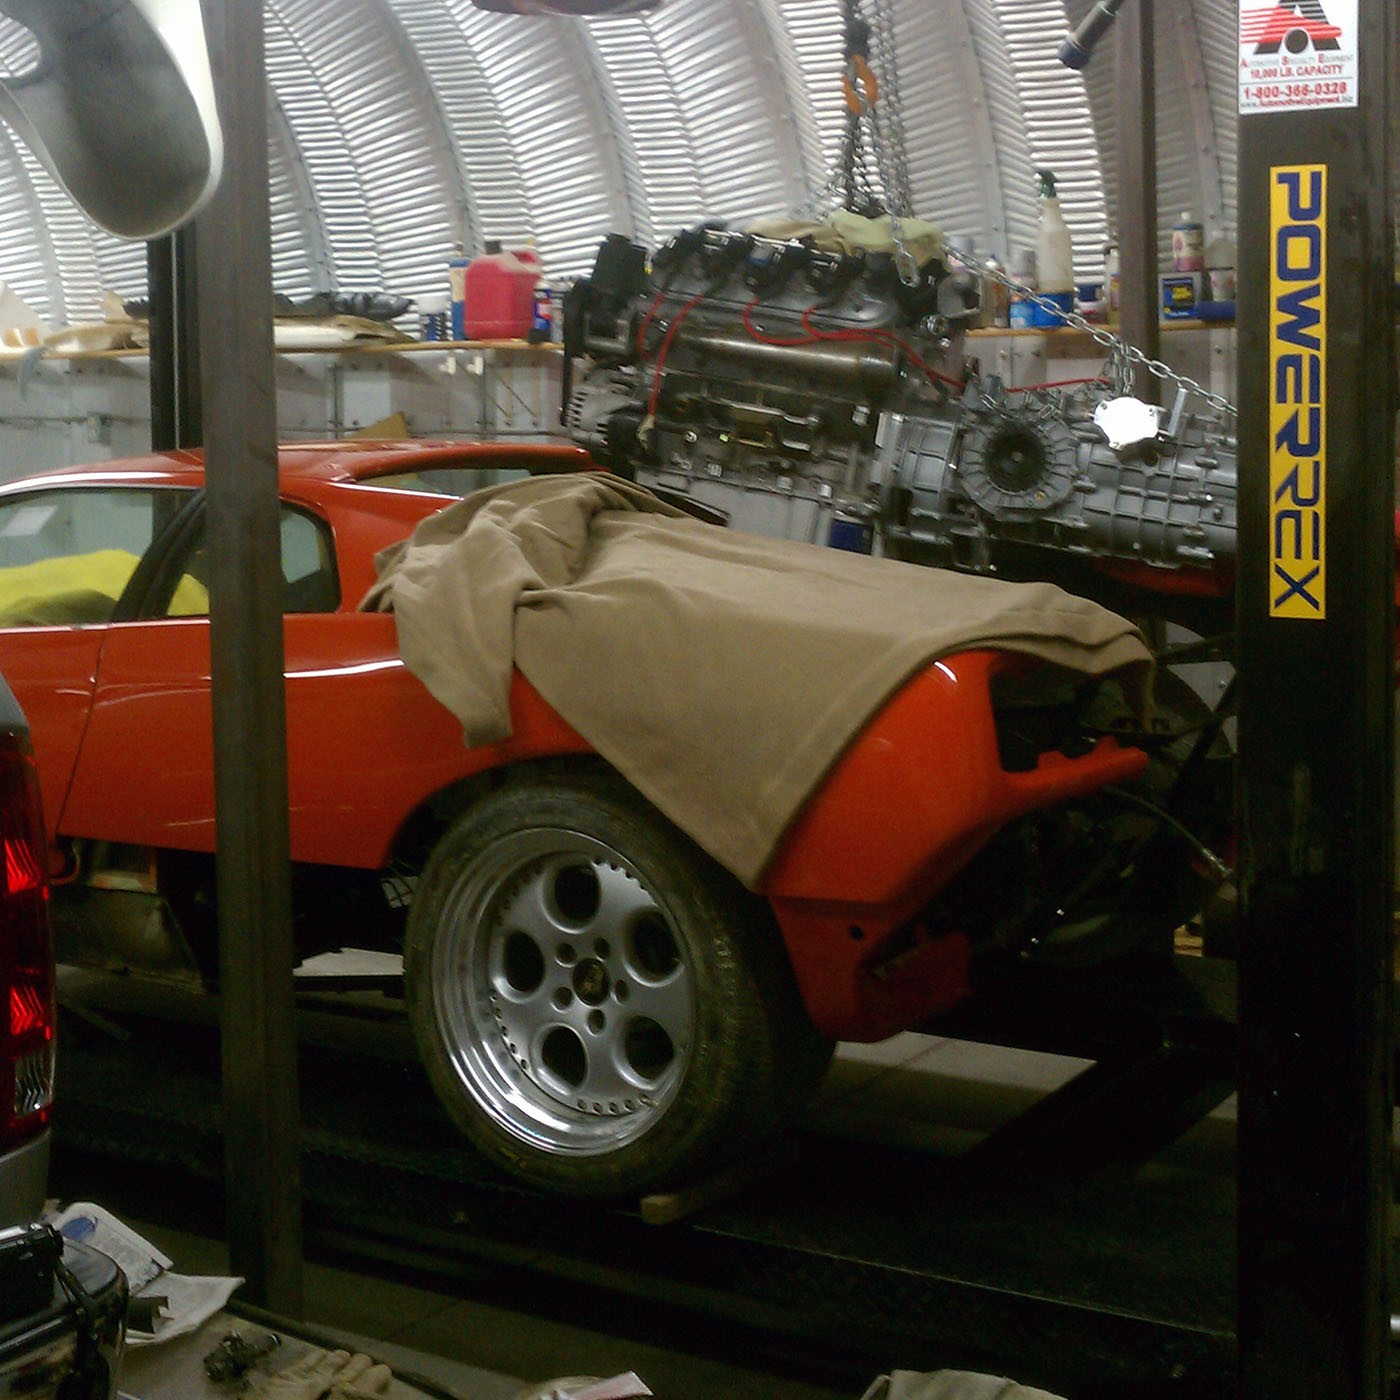 Porsche 911 Engine Swap: Lamborghini Diablo With LS3 V8 Engine Swap Has 550 HP